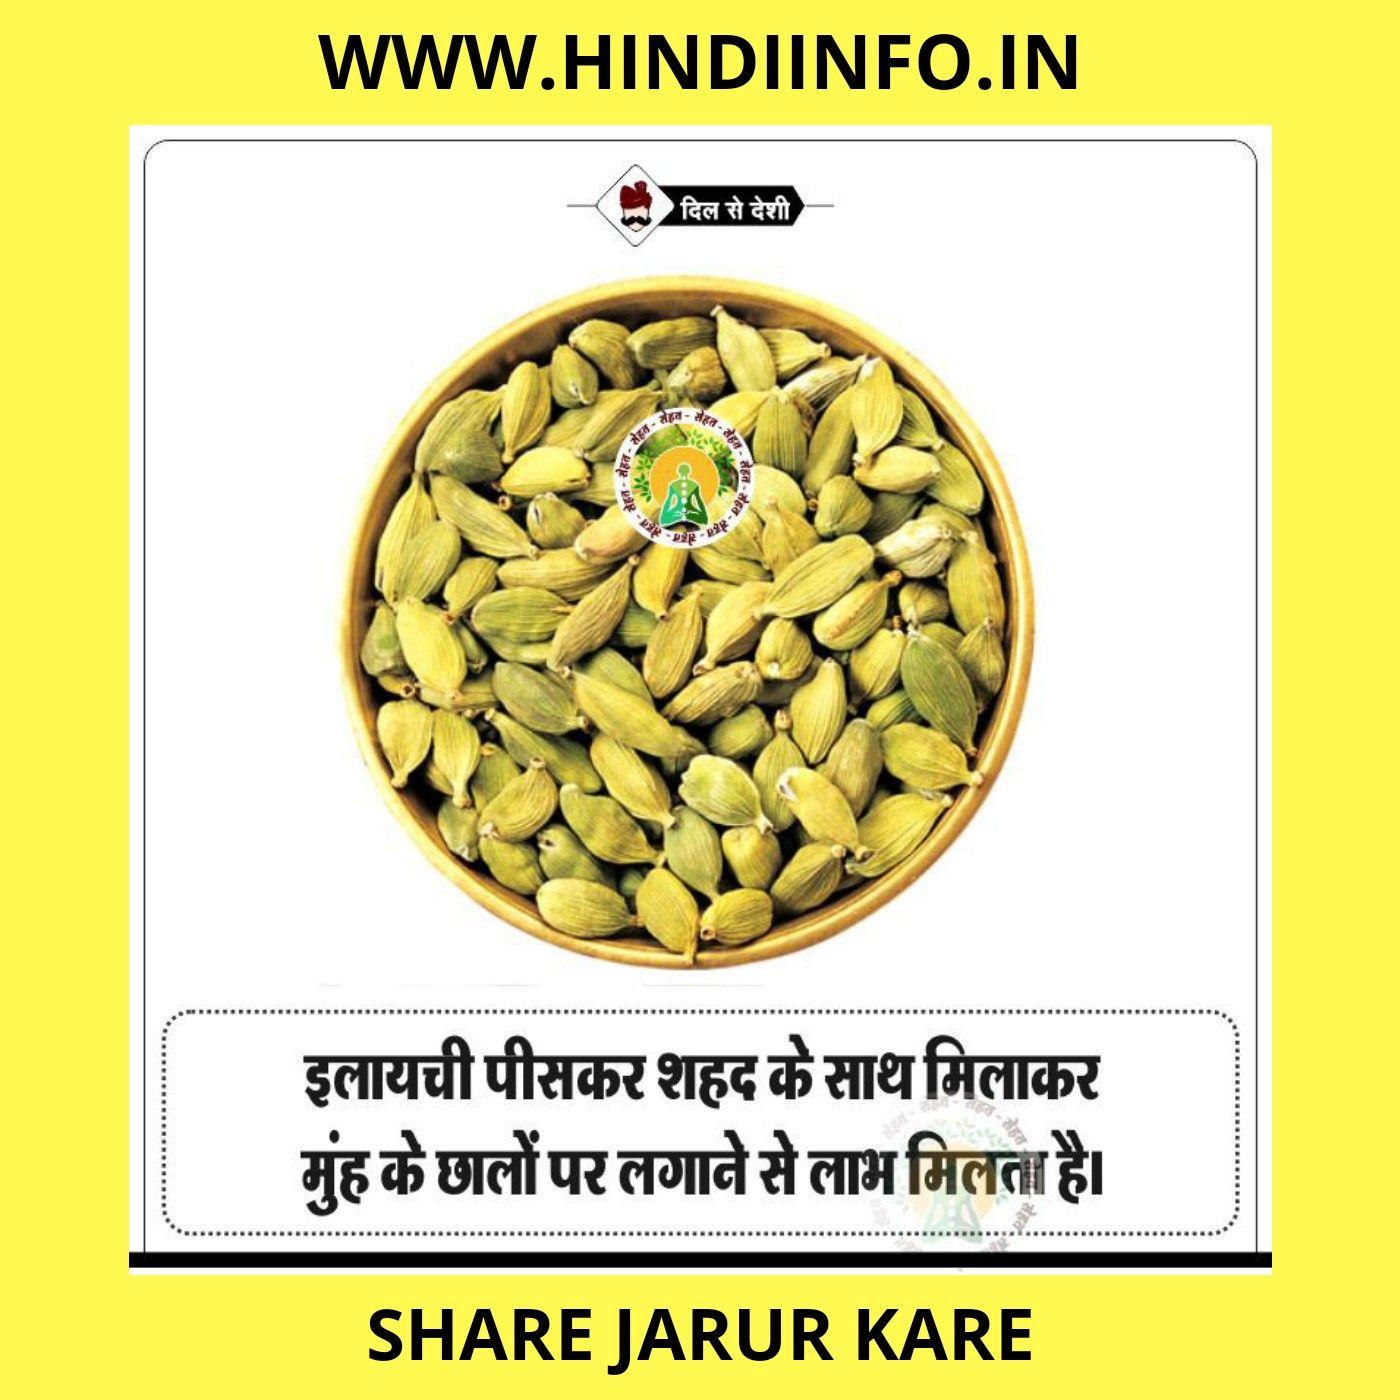 Hindi Education Website Health Tips Health Dog Food Recipes